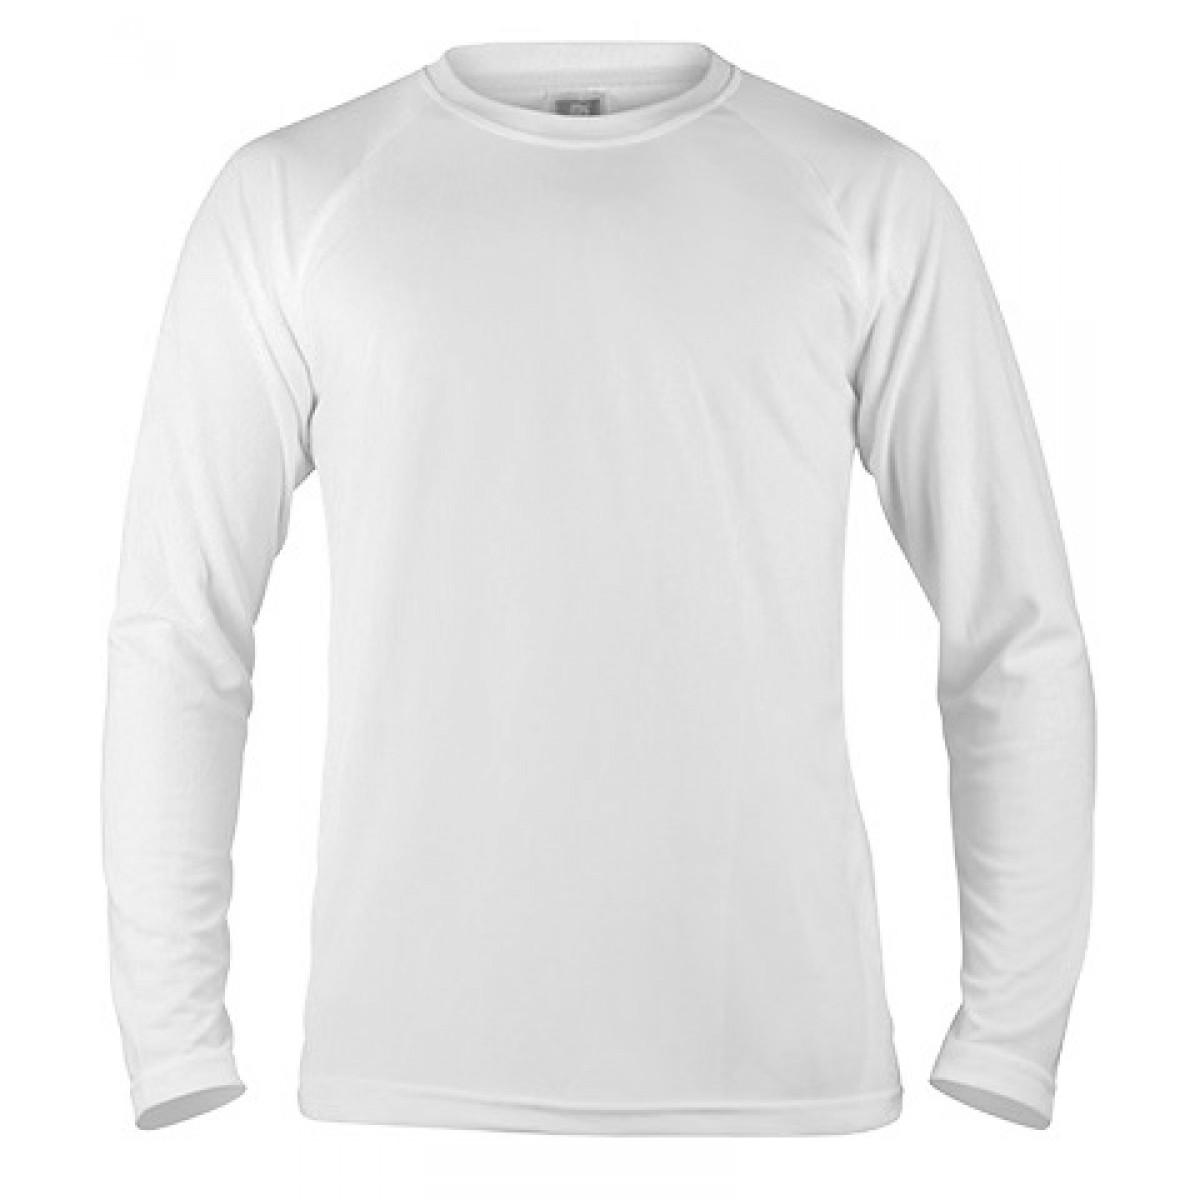 Long Sleeve Mesh Performance T-shirt-White-2XL